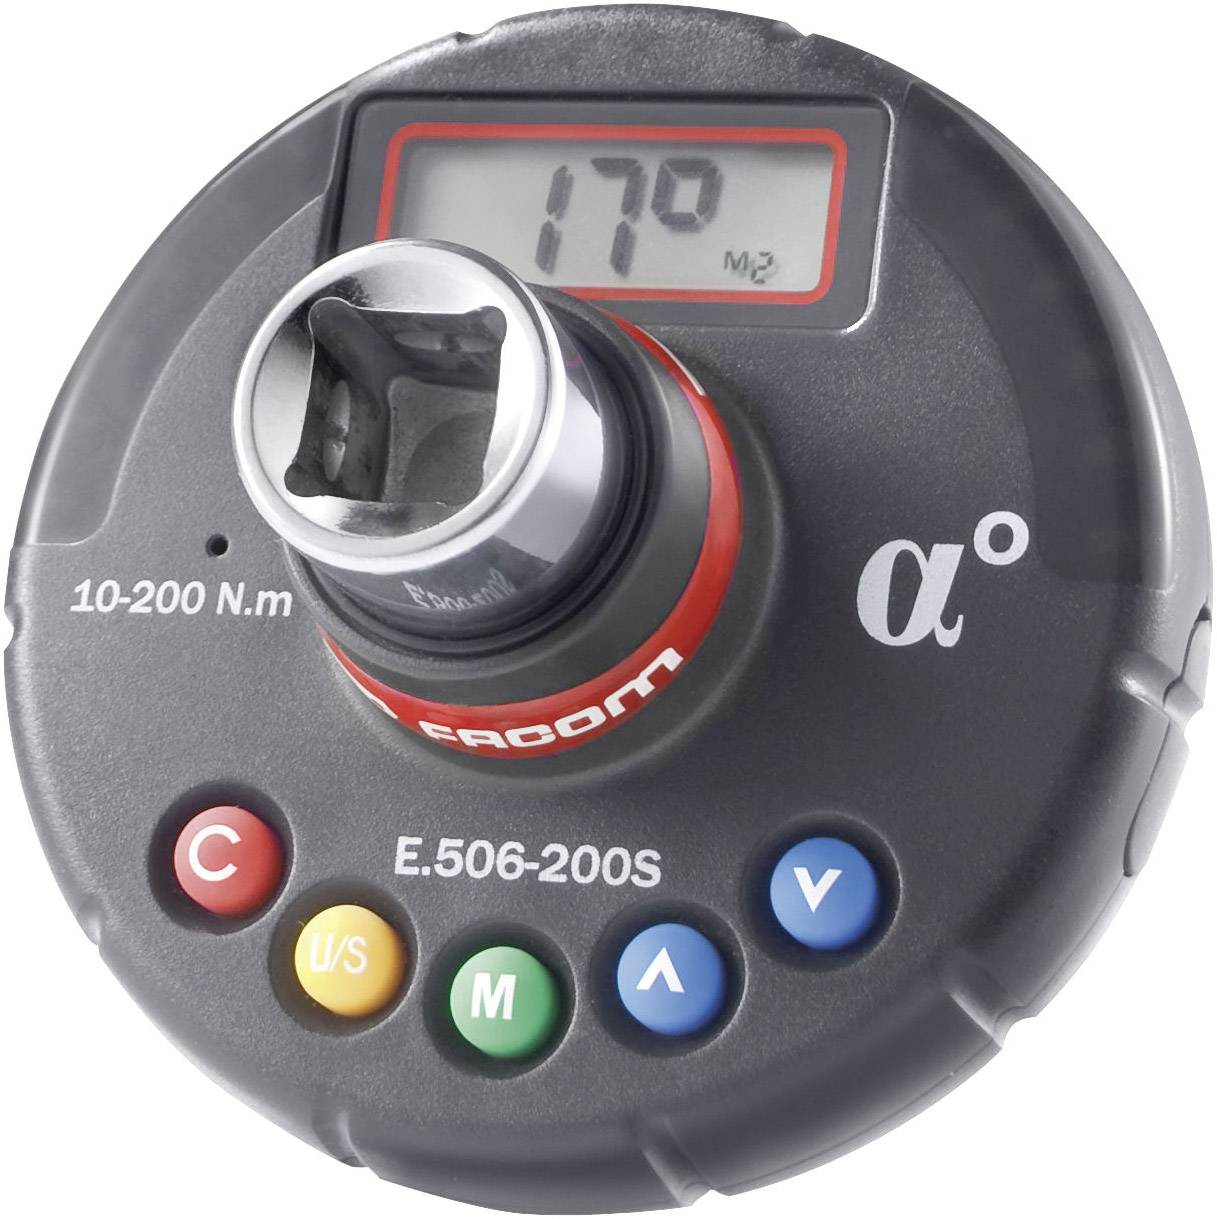 "Digitální momentový adaptér na ráčnu Facom E.506-200S, 1/2"" (12,5 mm), 10 - 200 Nm"